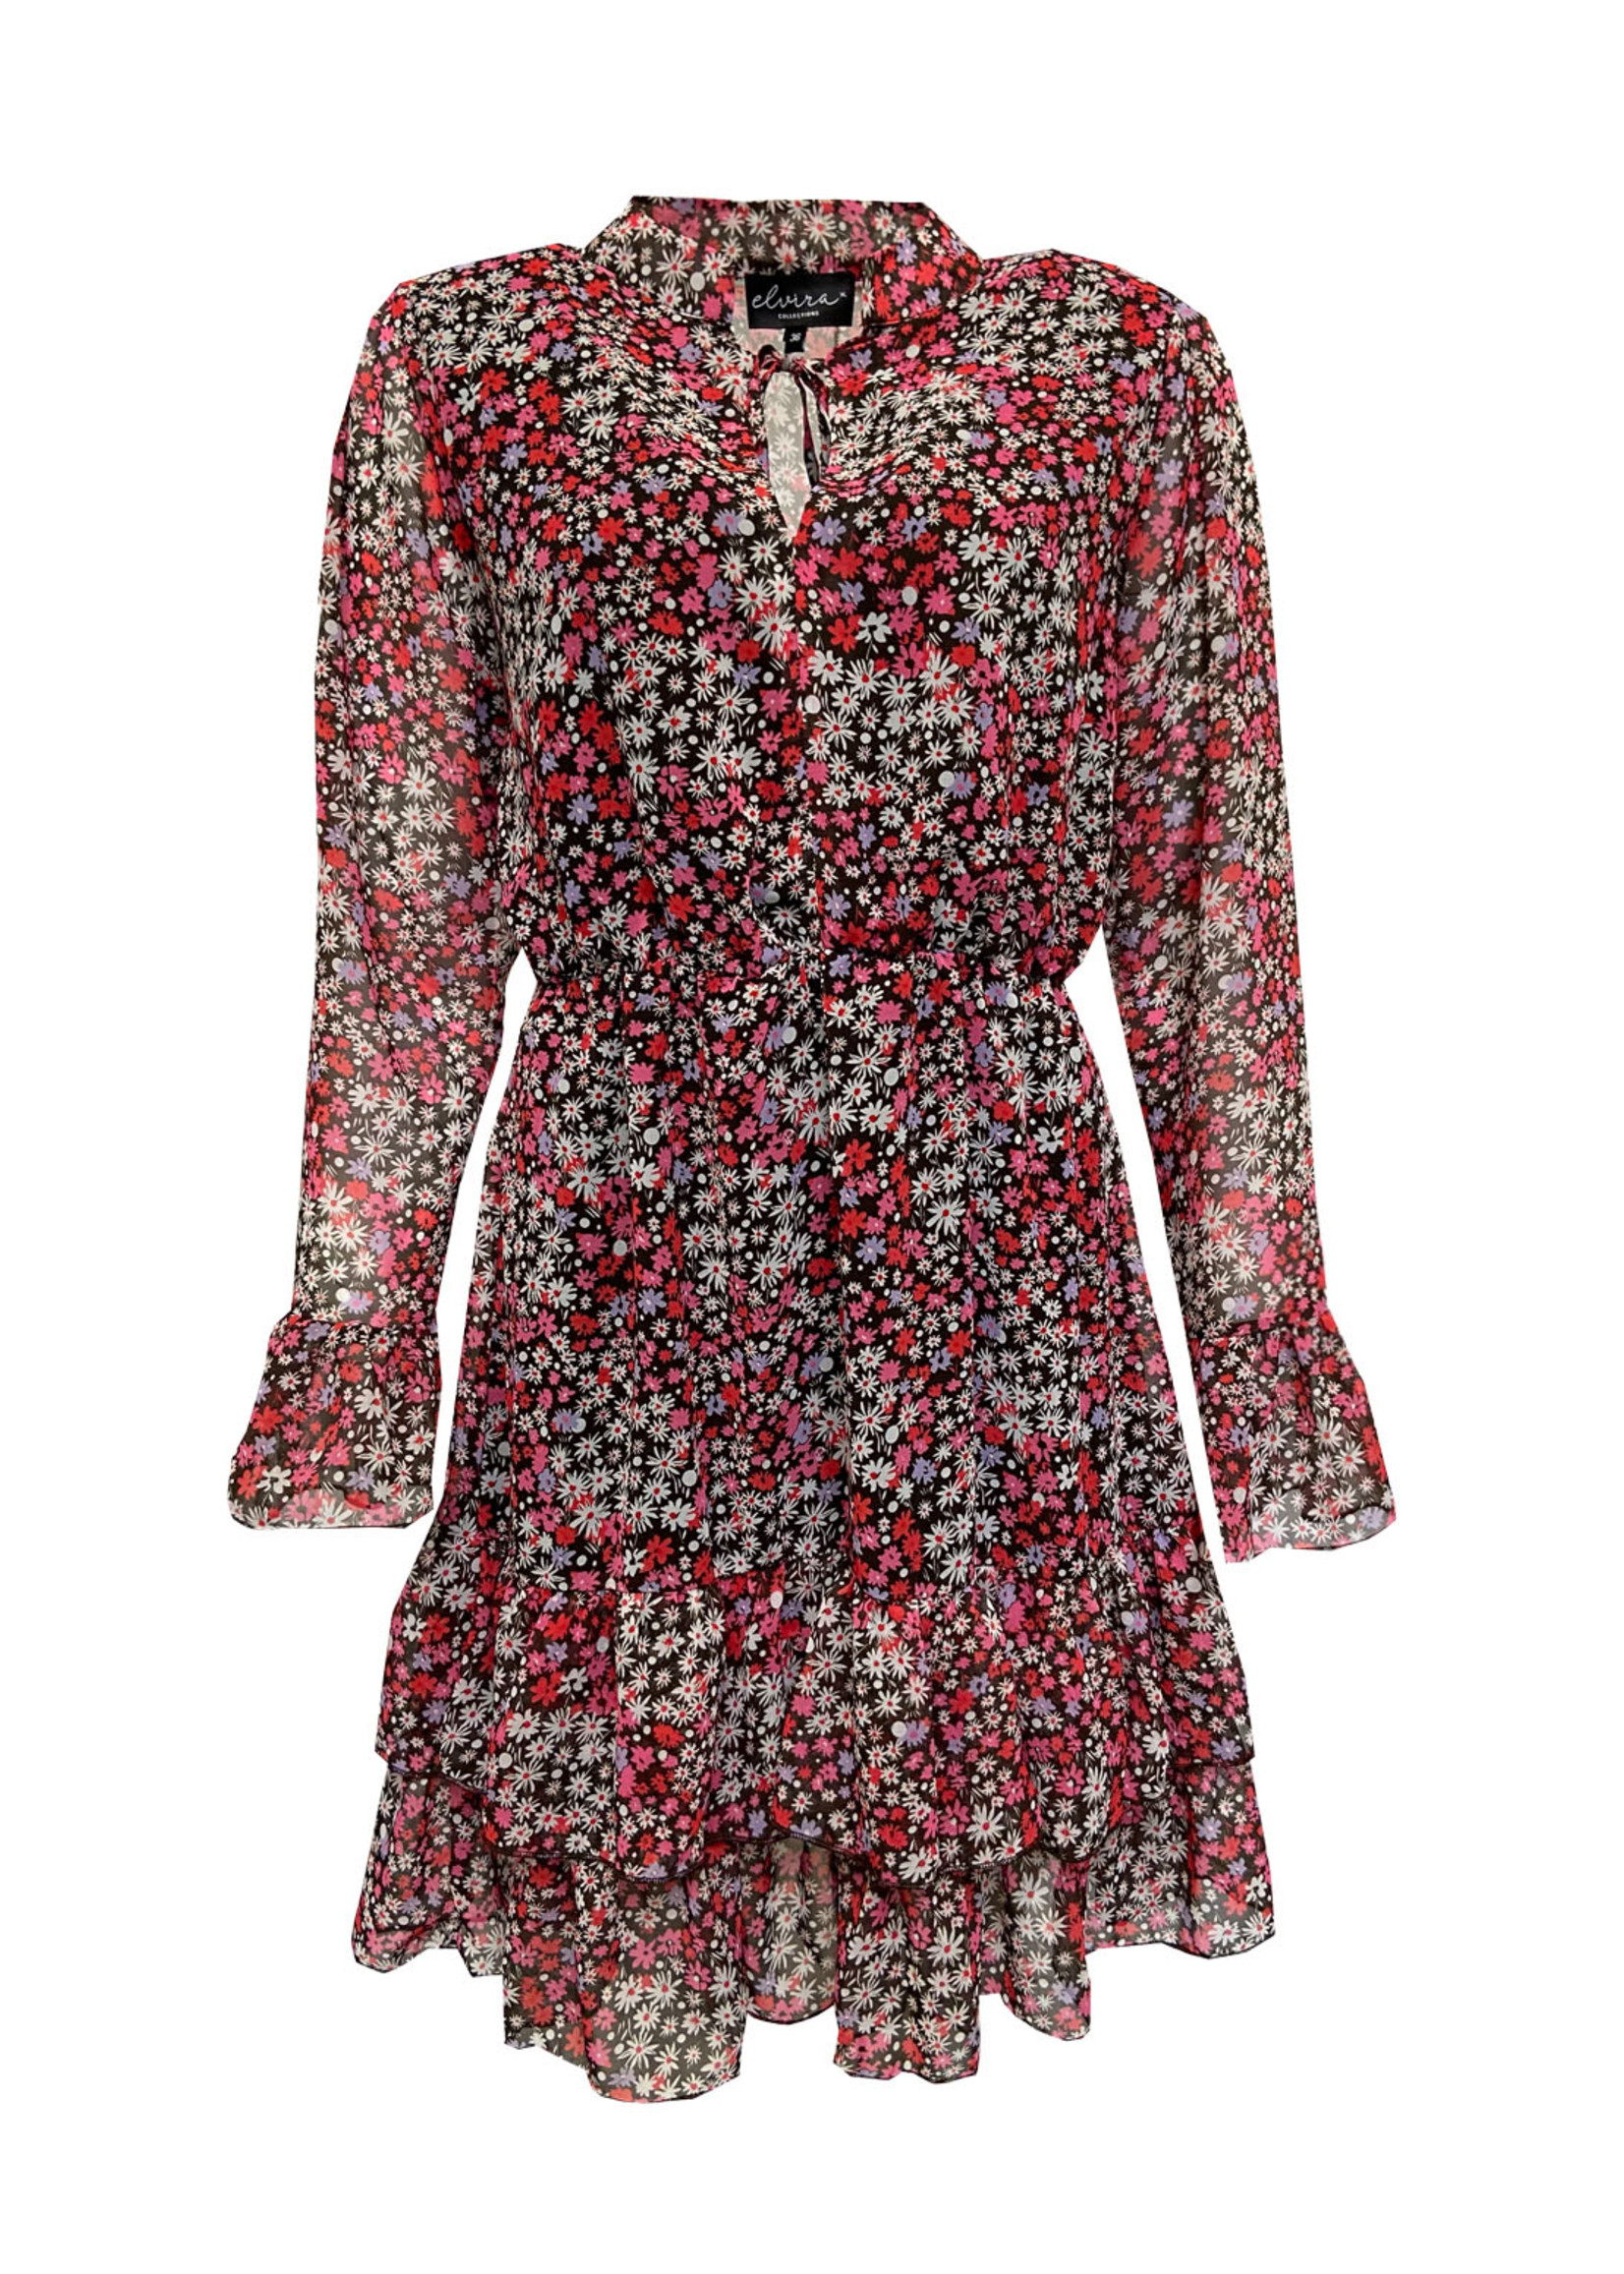 Elvira Collections Elvira Collections Jasmijn Dress